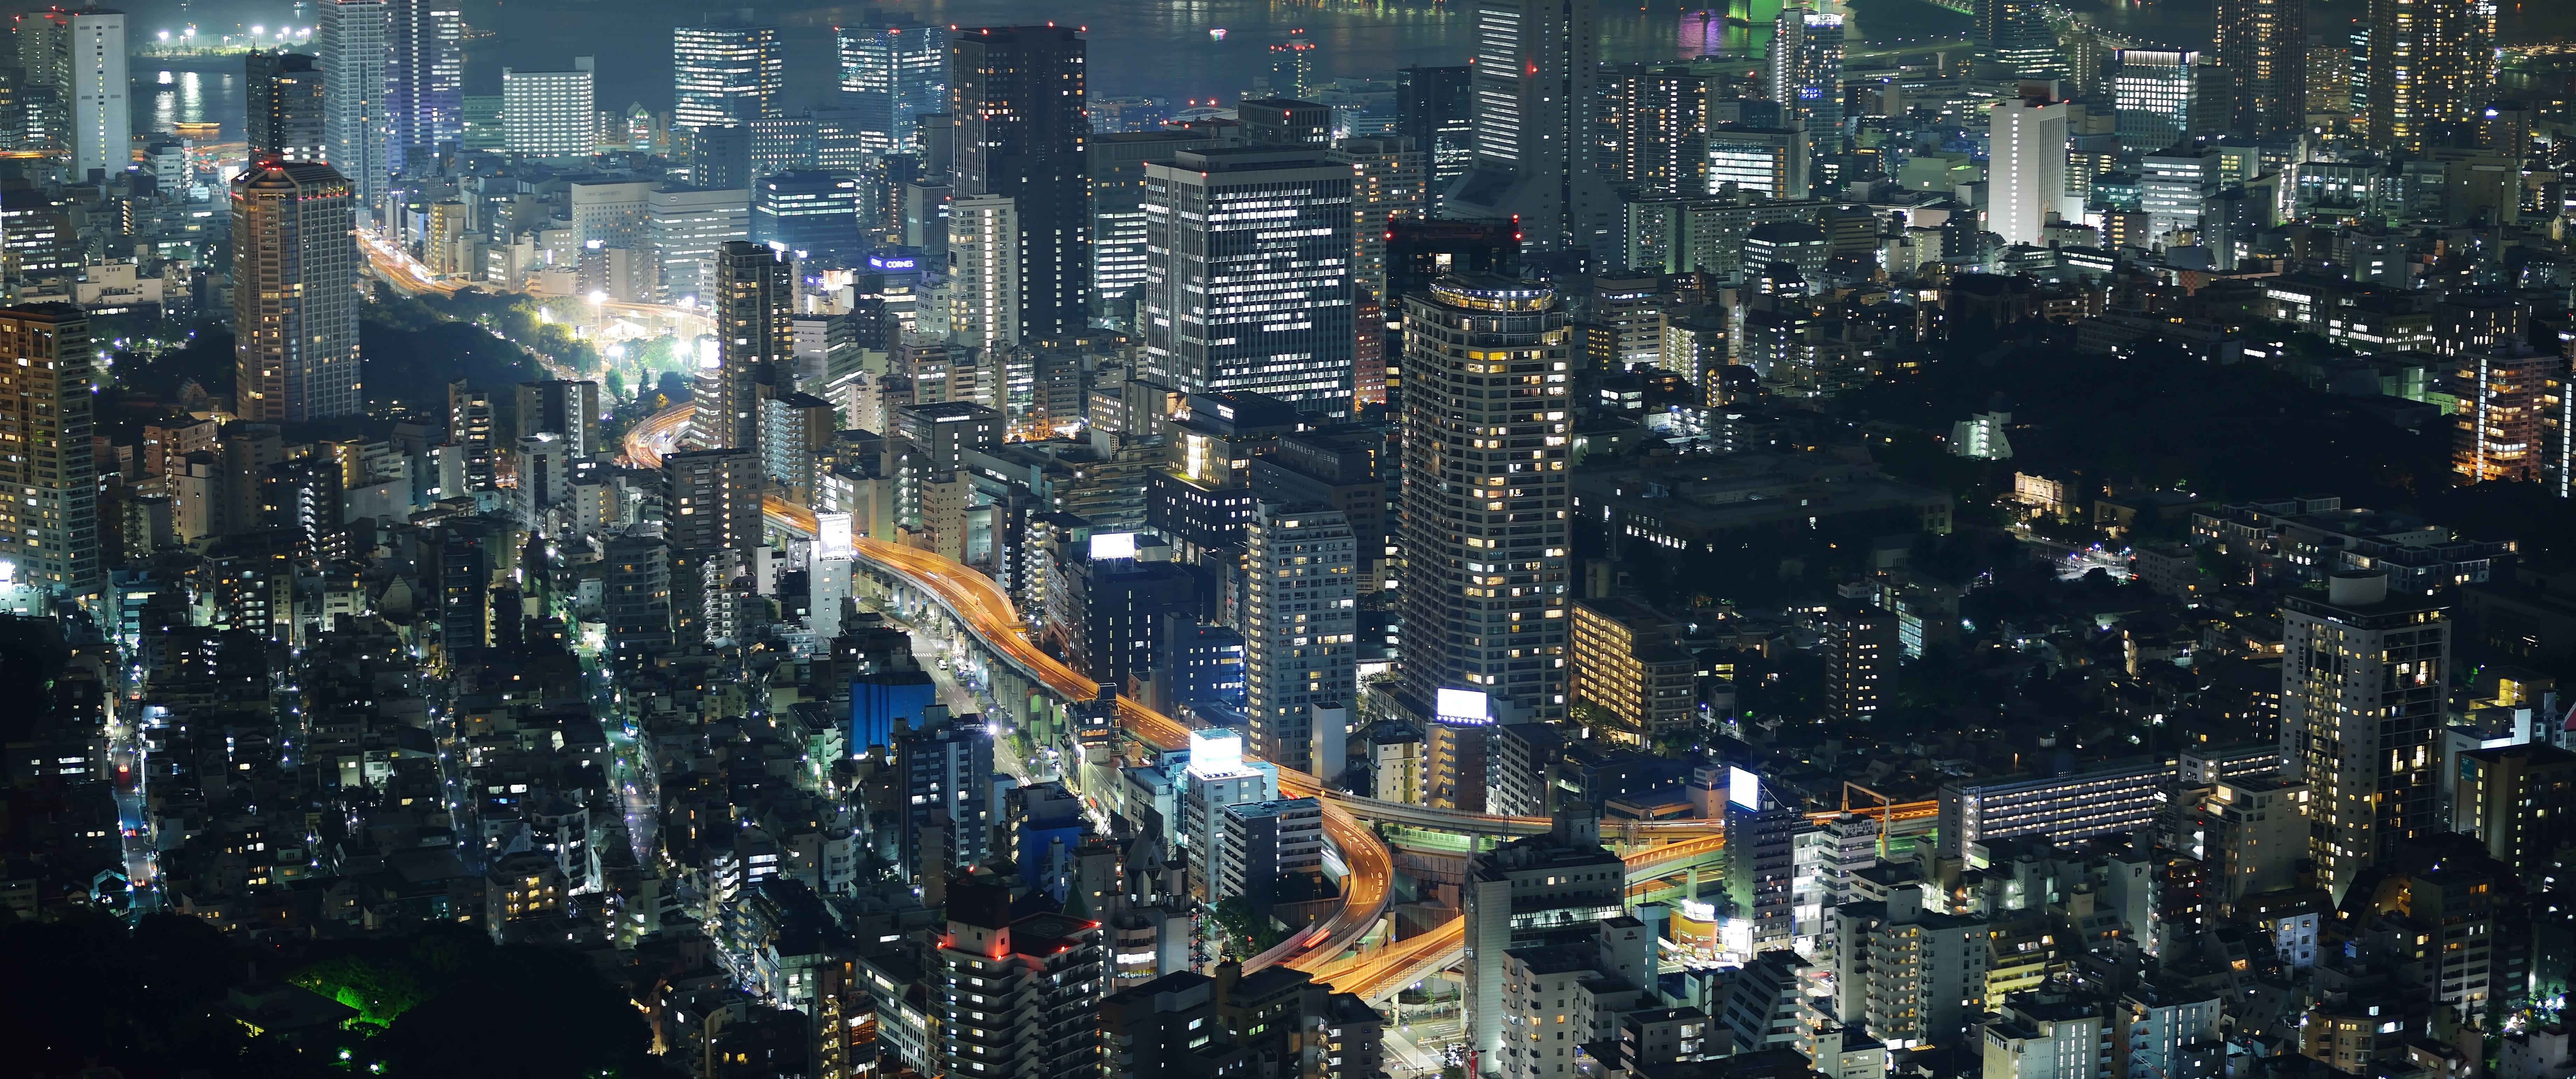 21 9 Tokyo Wallpaper - Singebloggg